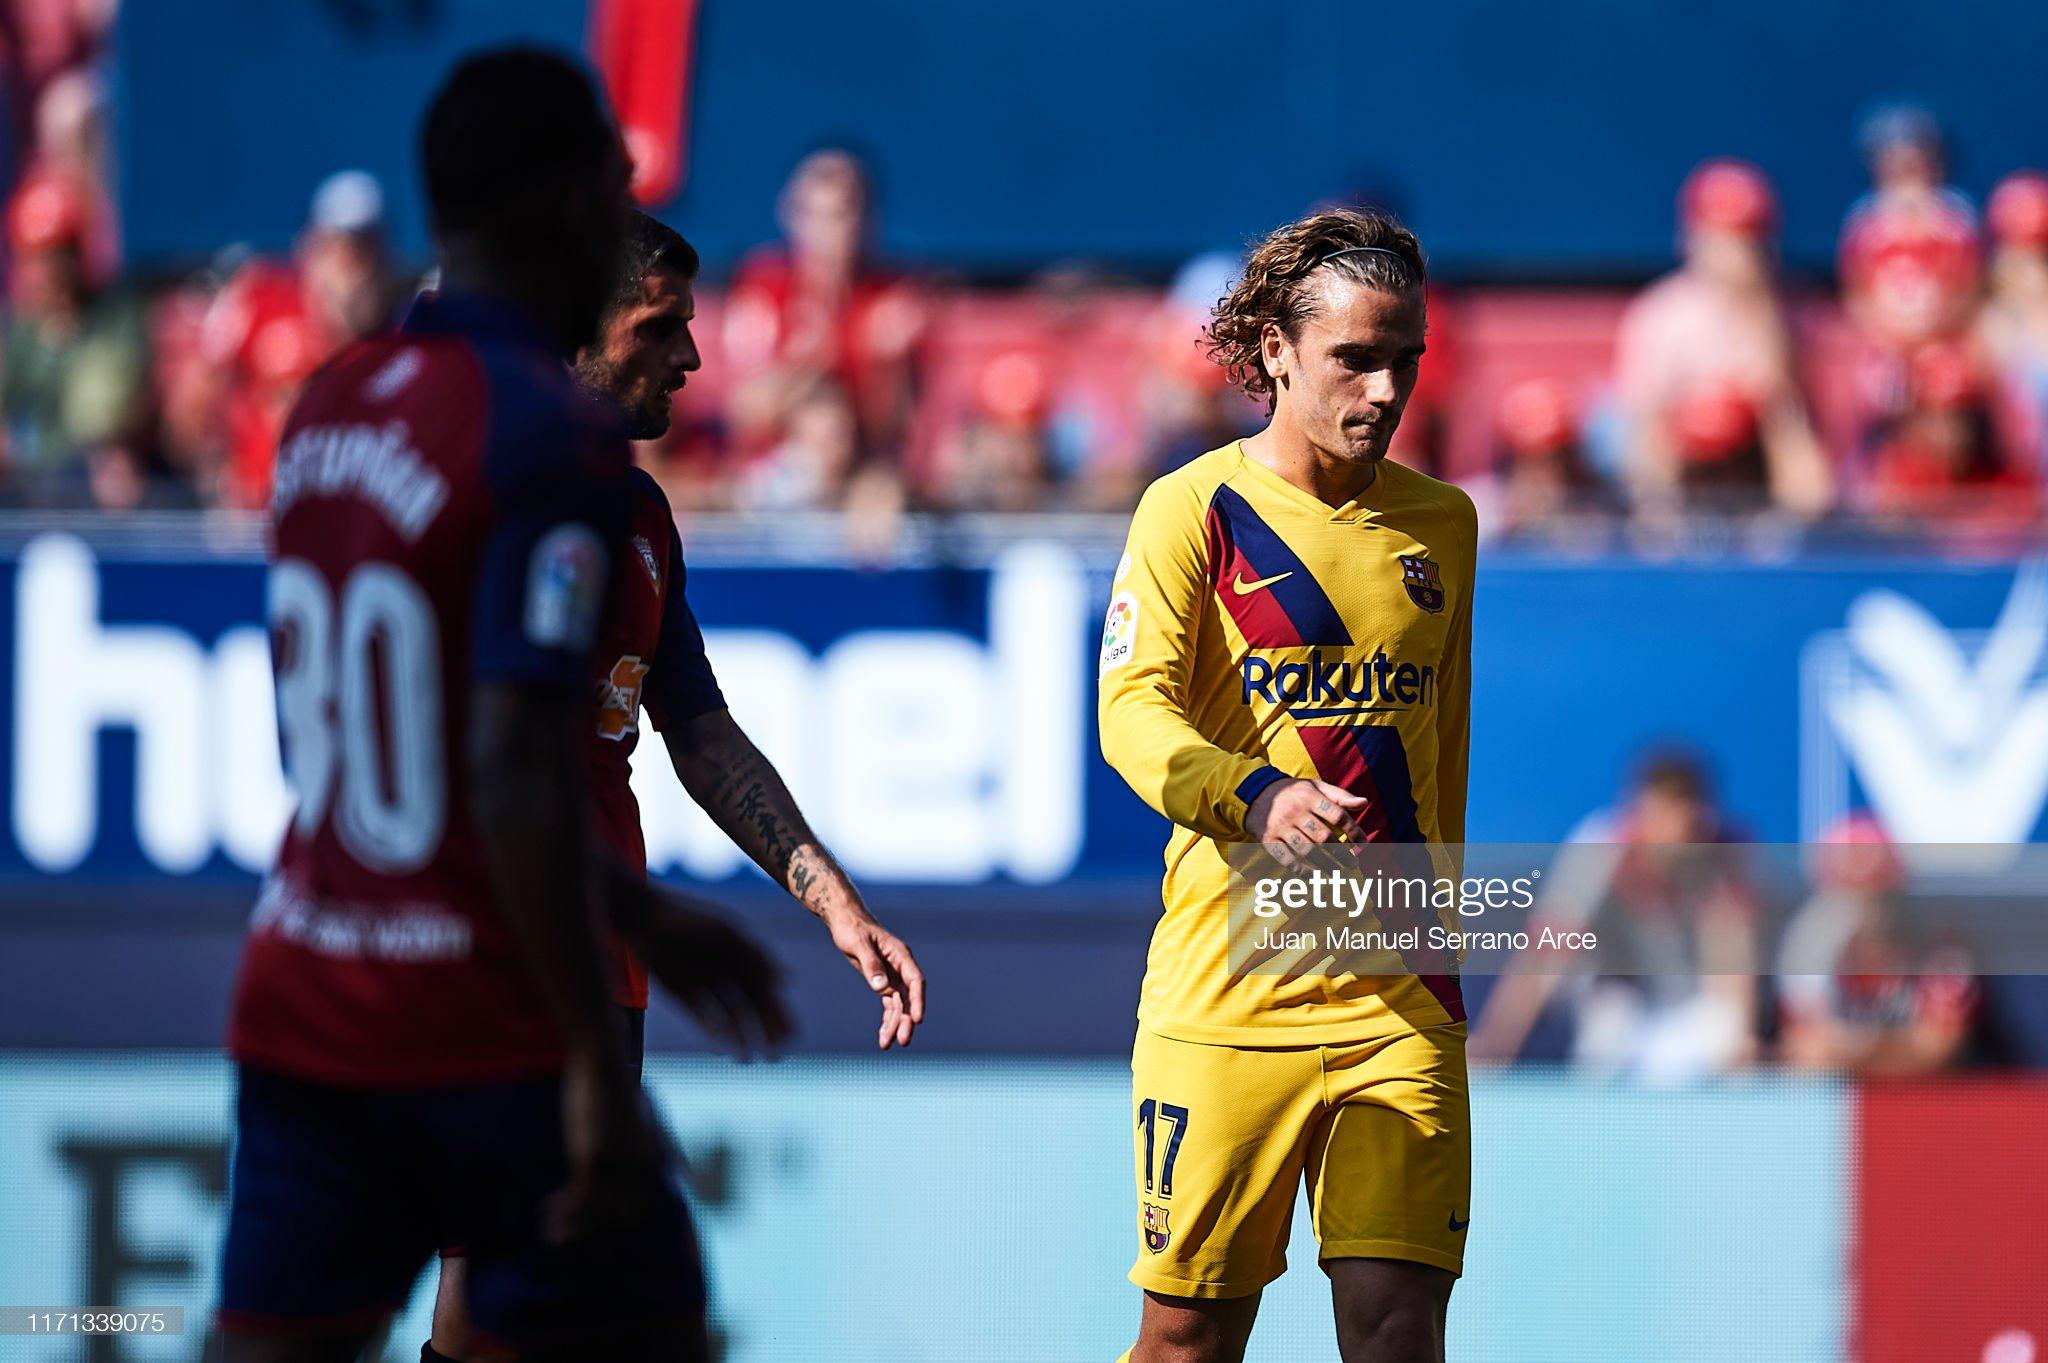 صور مباراة : أوساسونا - برشلونة 2-2 ( 31-08-2019 )  Antoine-griezmann-of-fc-barcelona-reacts-during-the-liga-match-ca-picture-id1171339075?s=2048x2048